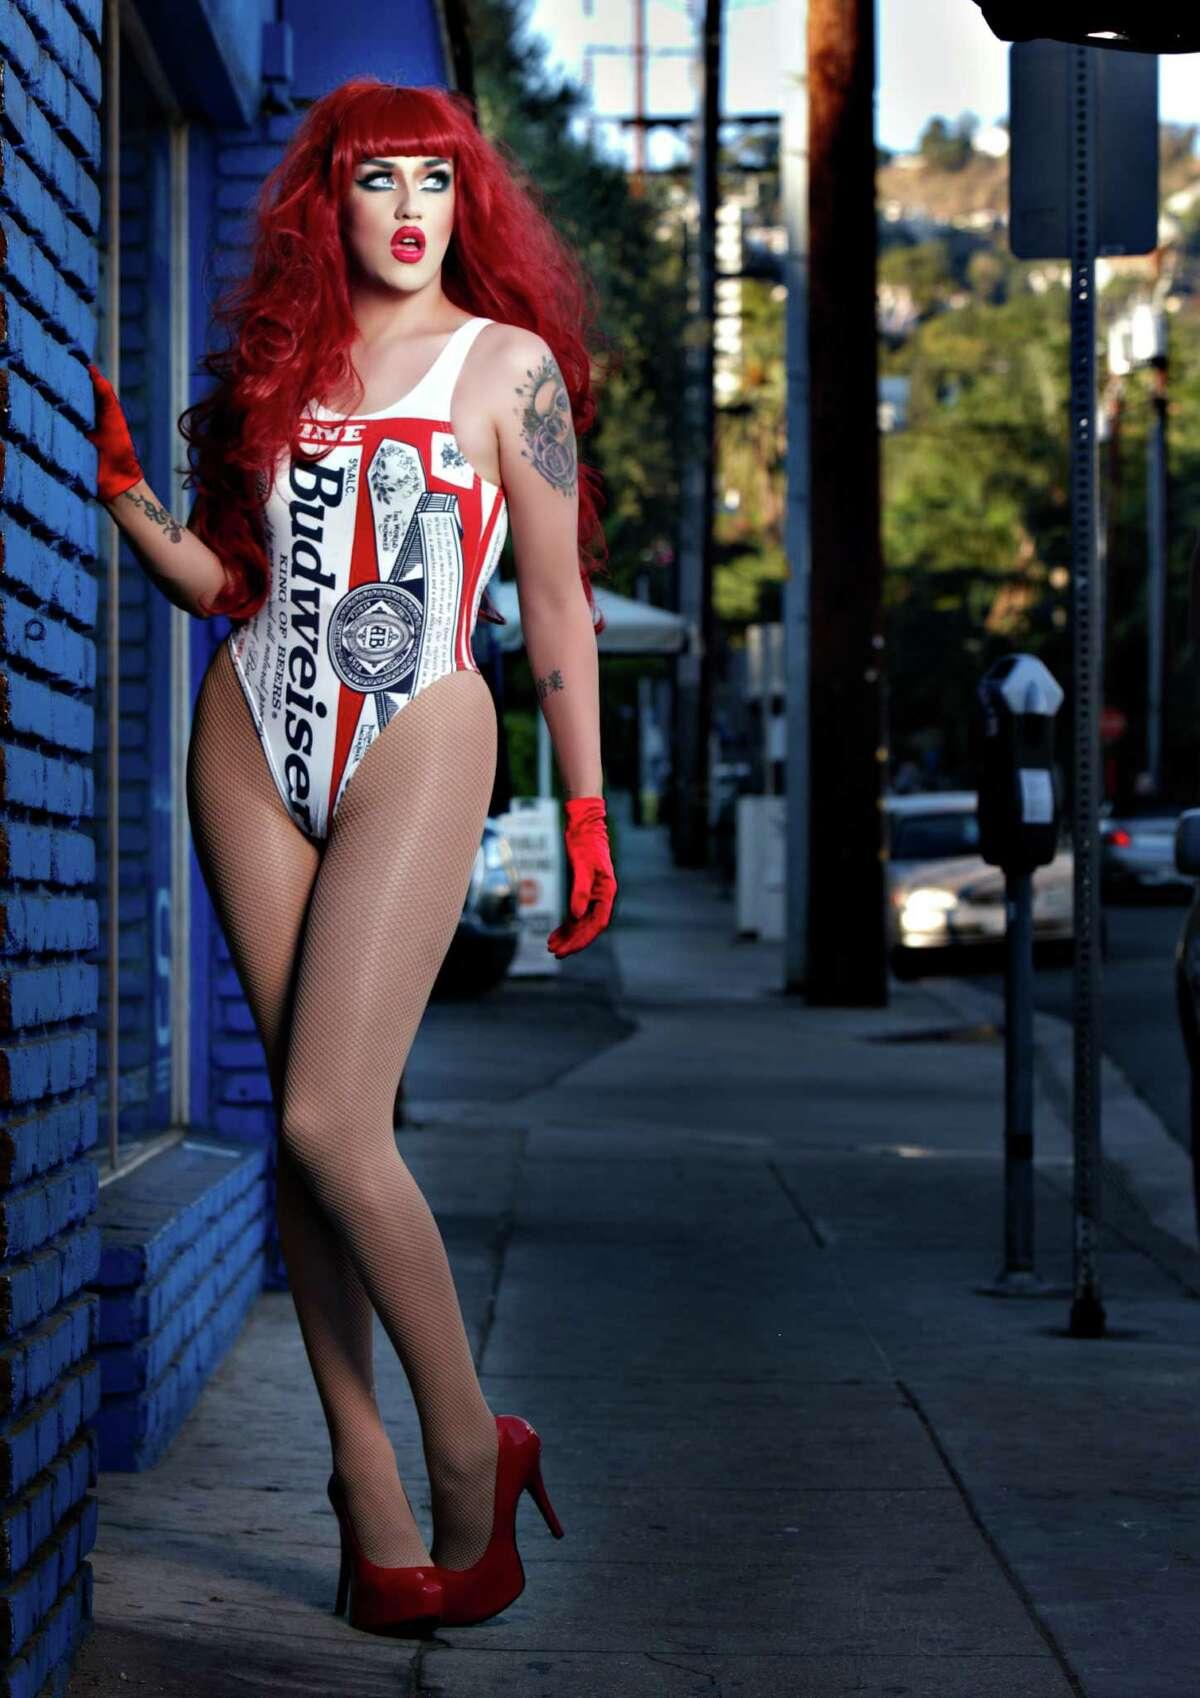 RuPaul's Drag Race contestant Adore Delano was also an American Idol season 7 semifinalist as Danny Noriega.